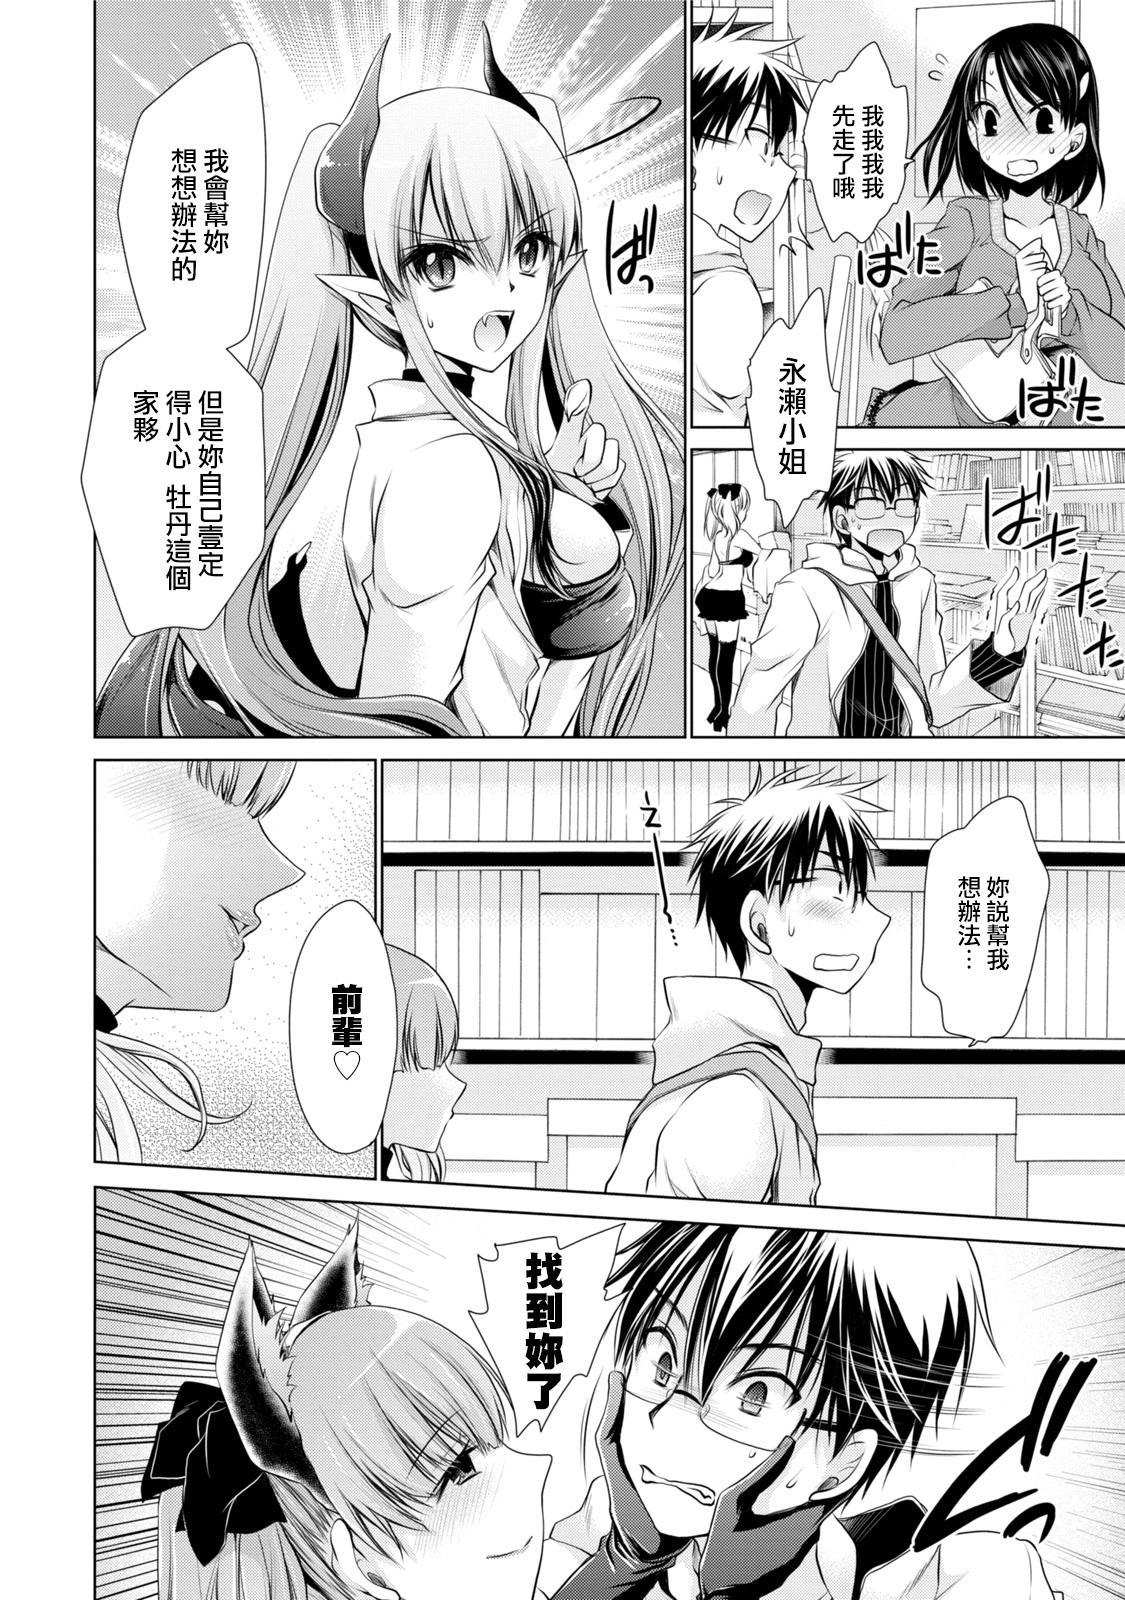 [Shinonome Ryu] Ore to Kanojo to Owaru Sekai - World's end LoveStory 1-5 [Chinese] [爱弹幕汉化组] [Digital] 77